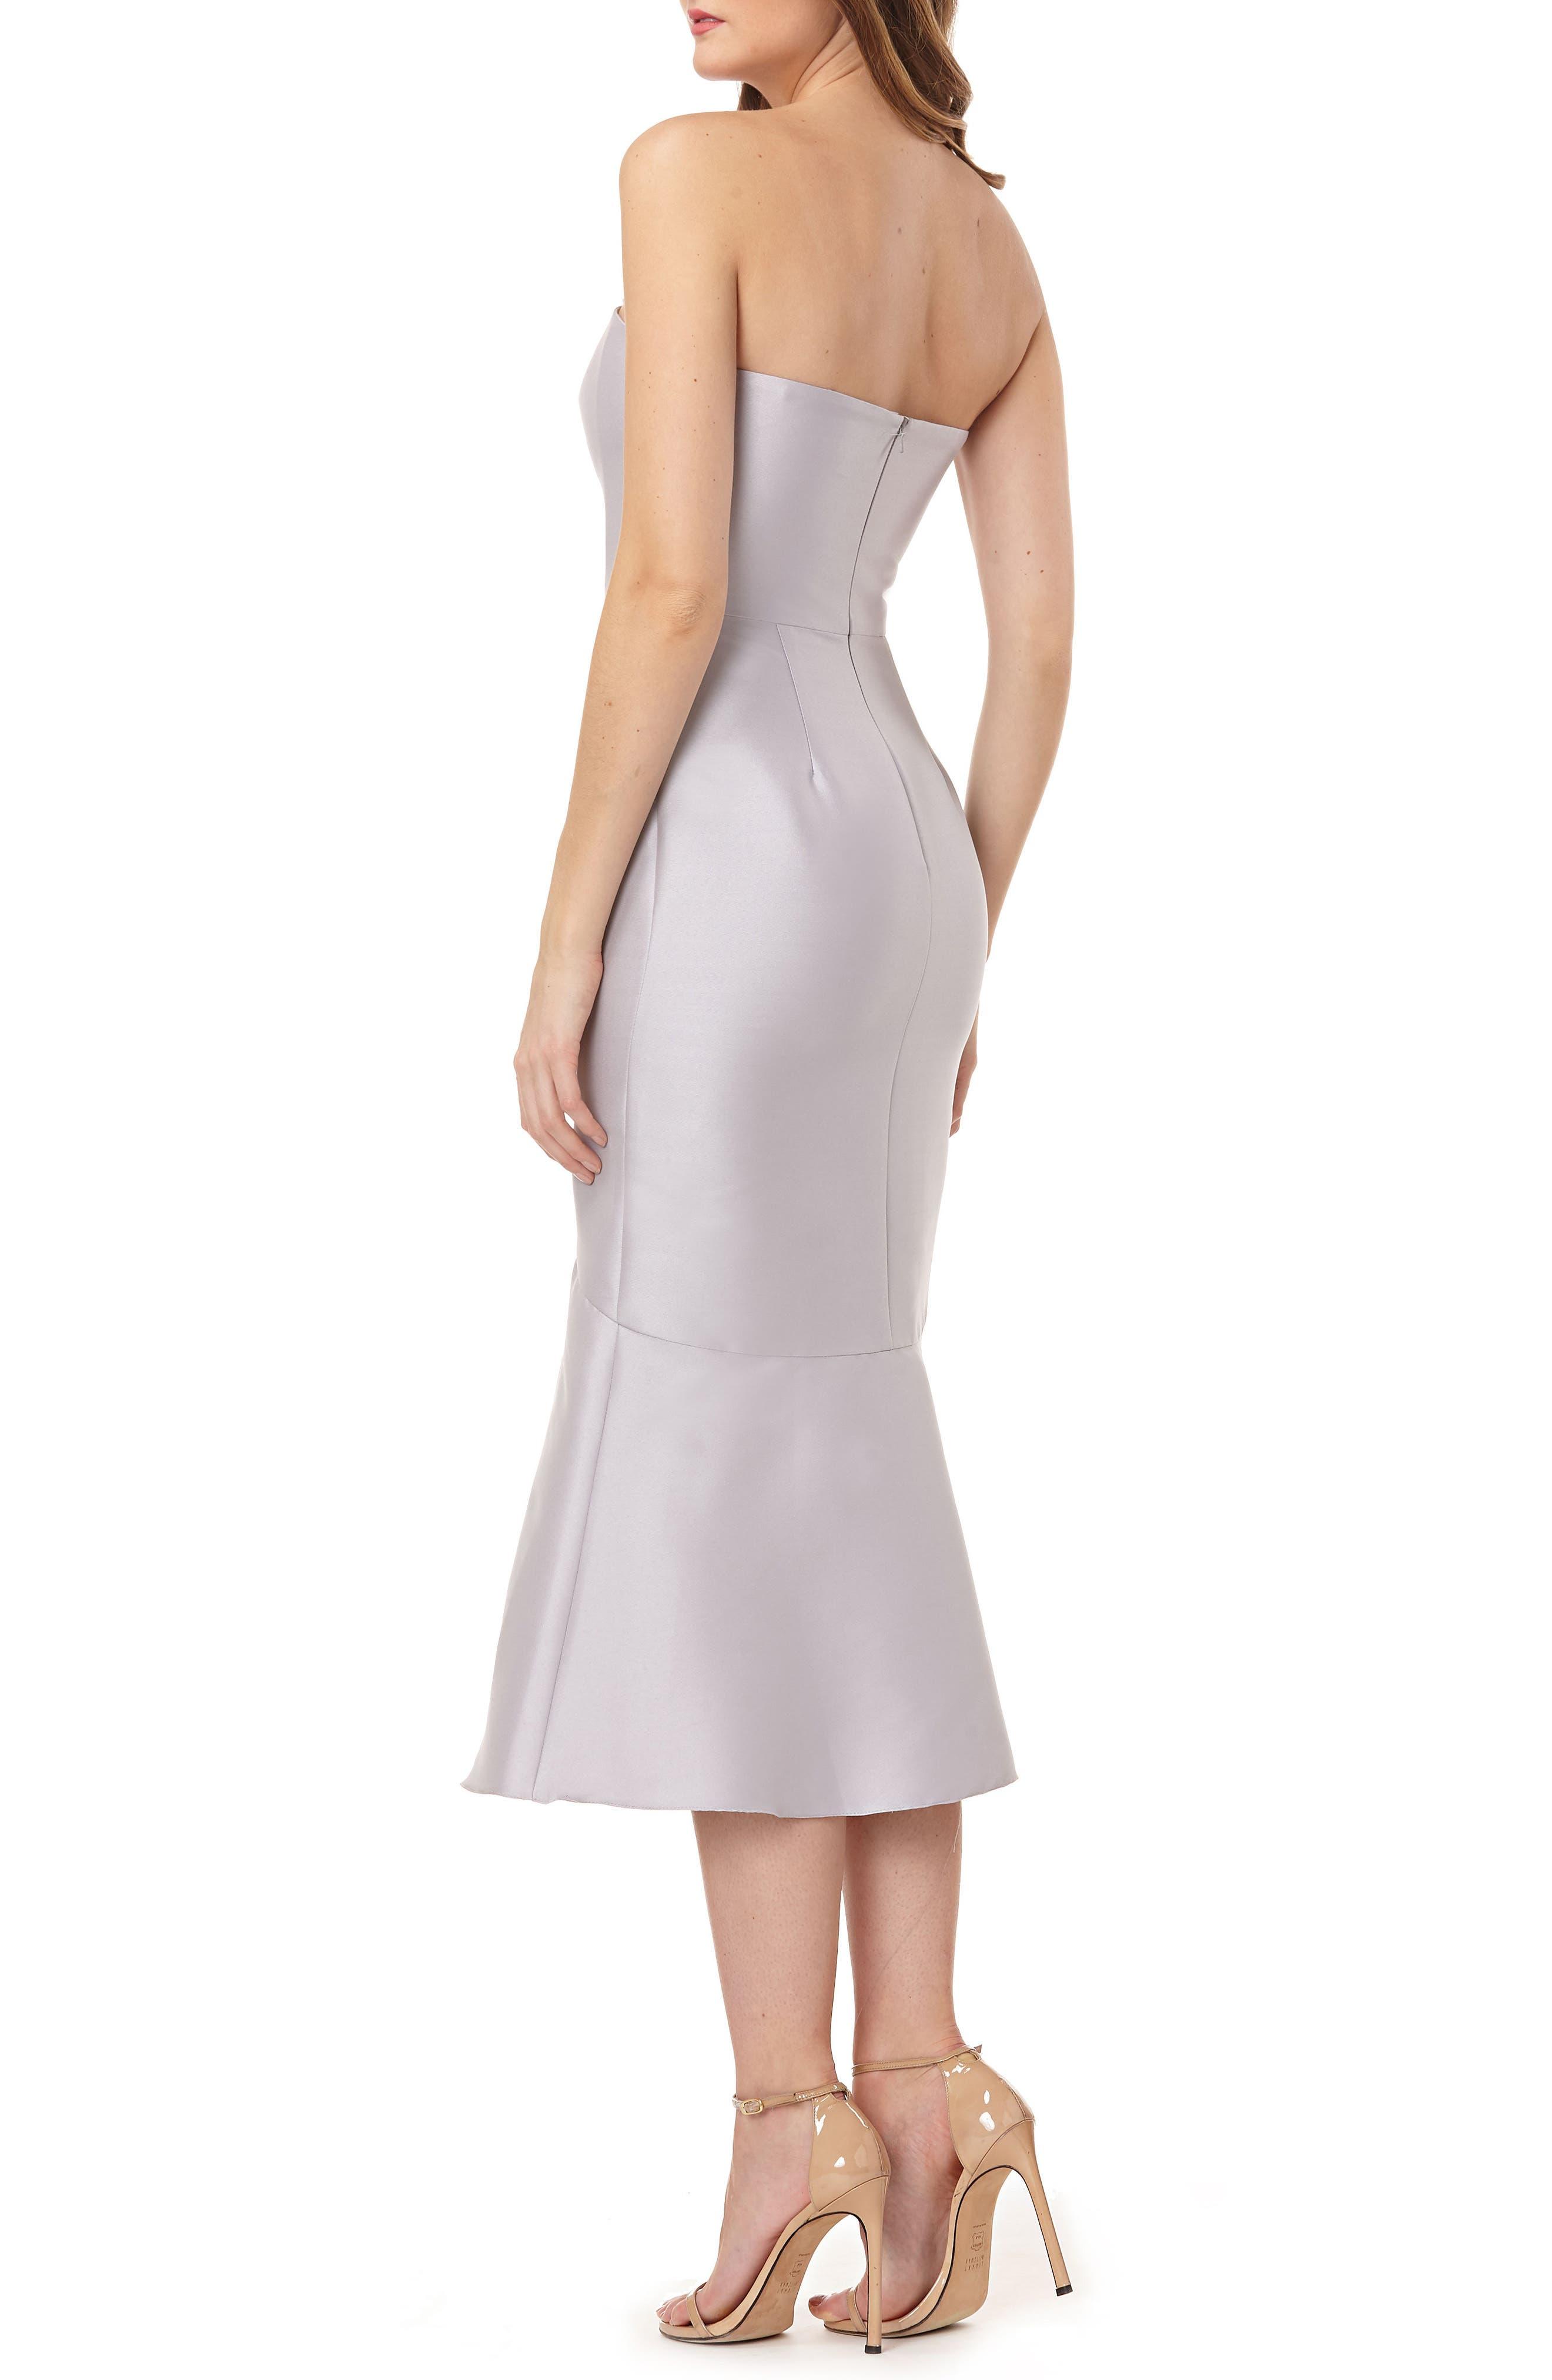 Strapless Satin Tea Length Dress,                             Alternate thumbnail 2, color,                             Dove Grey